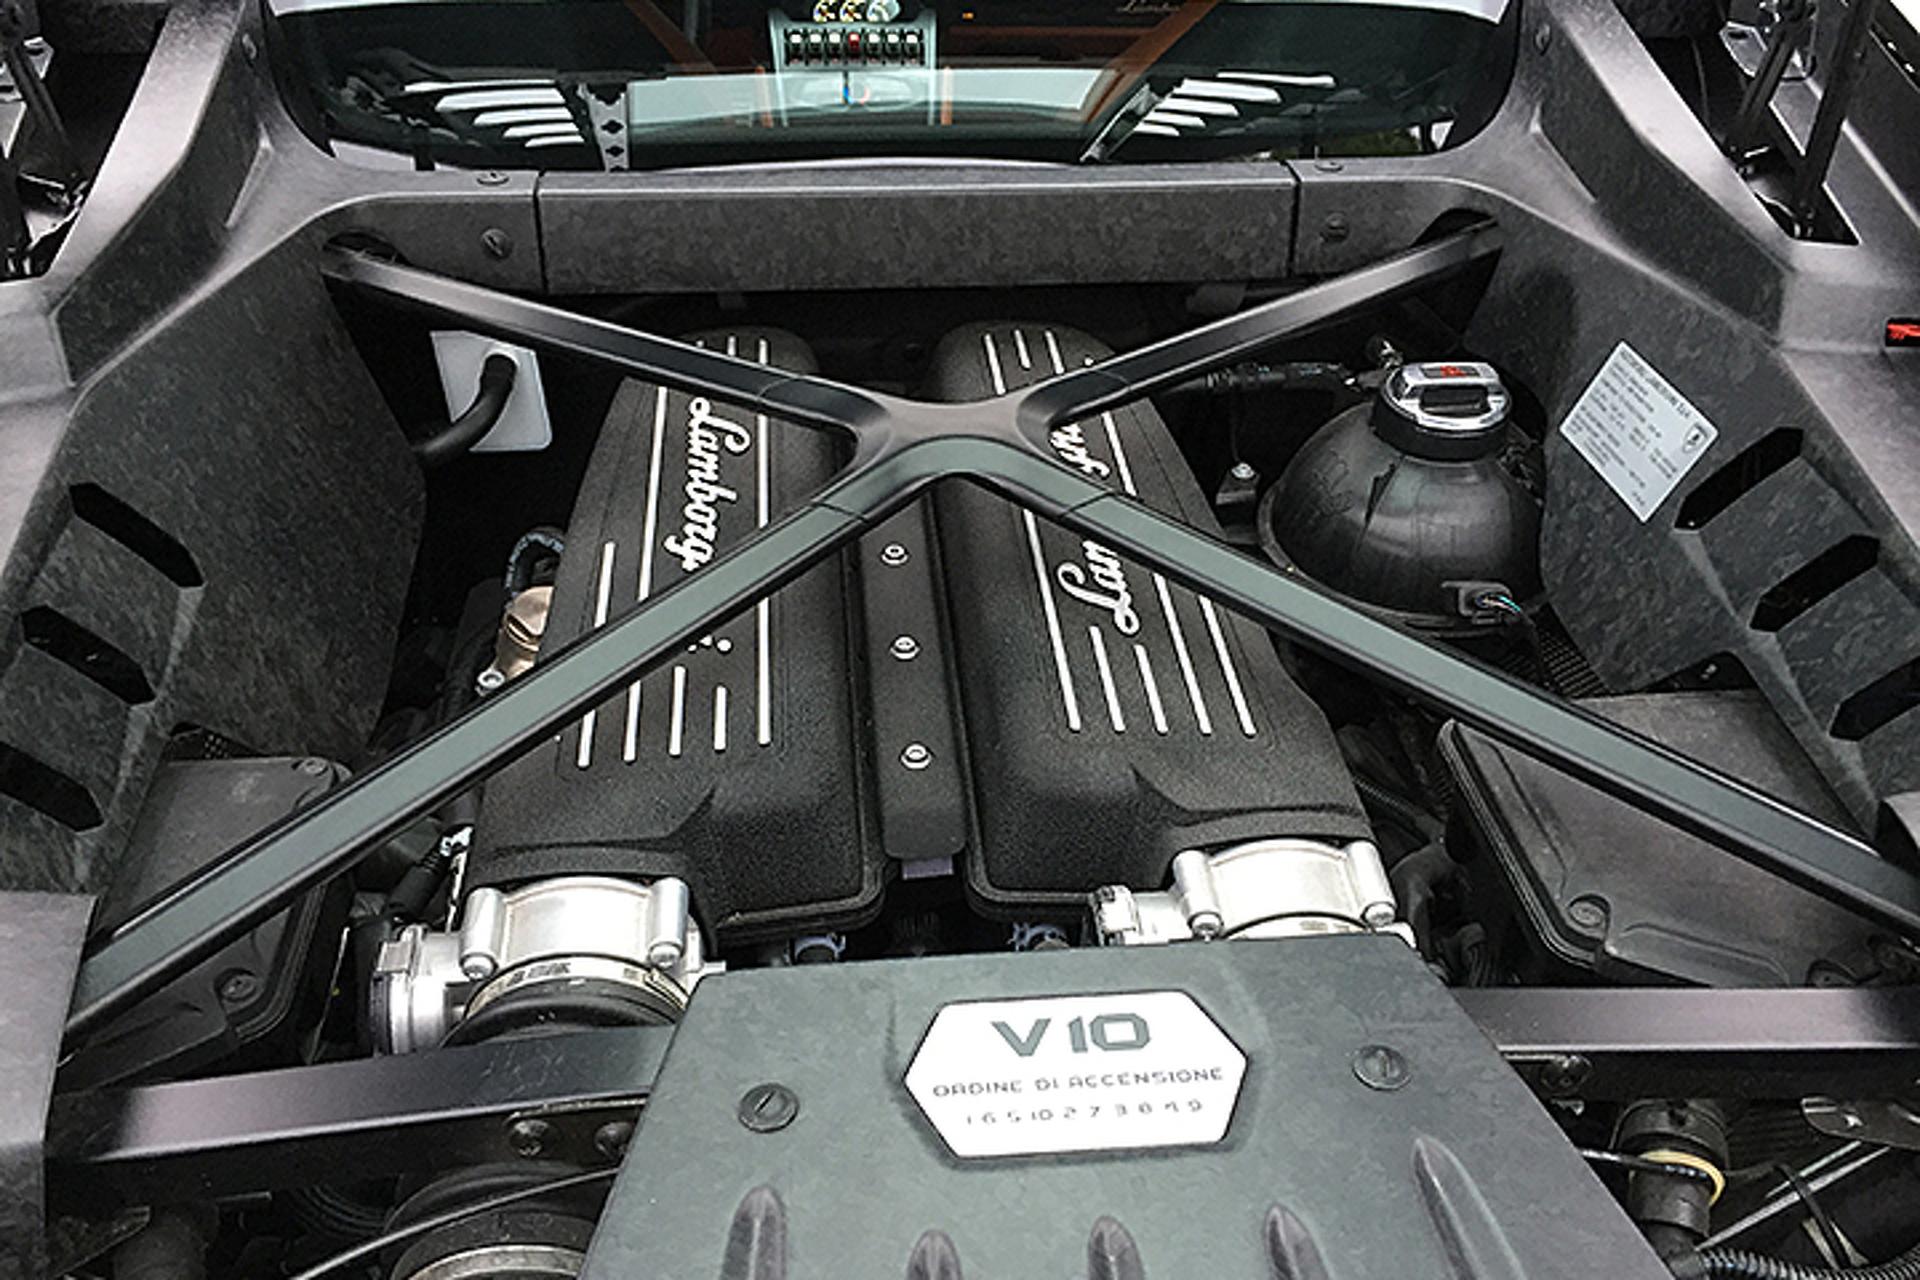 2015-lamborghini-huracan-truly-an-amazing-machine-review Exciting Lamborghini Huracán Lp 610-4 Cena Cars Trend